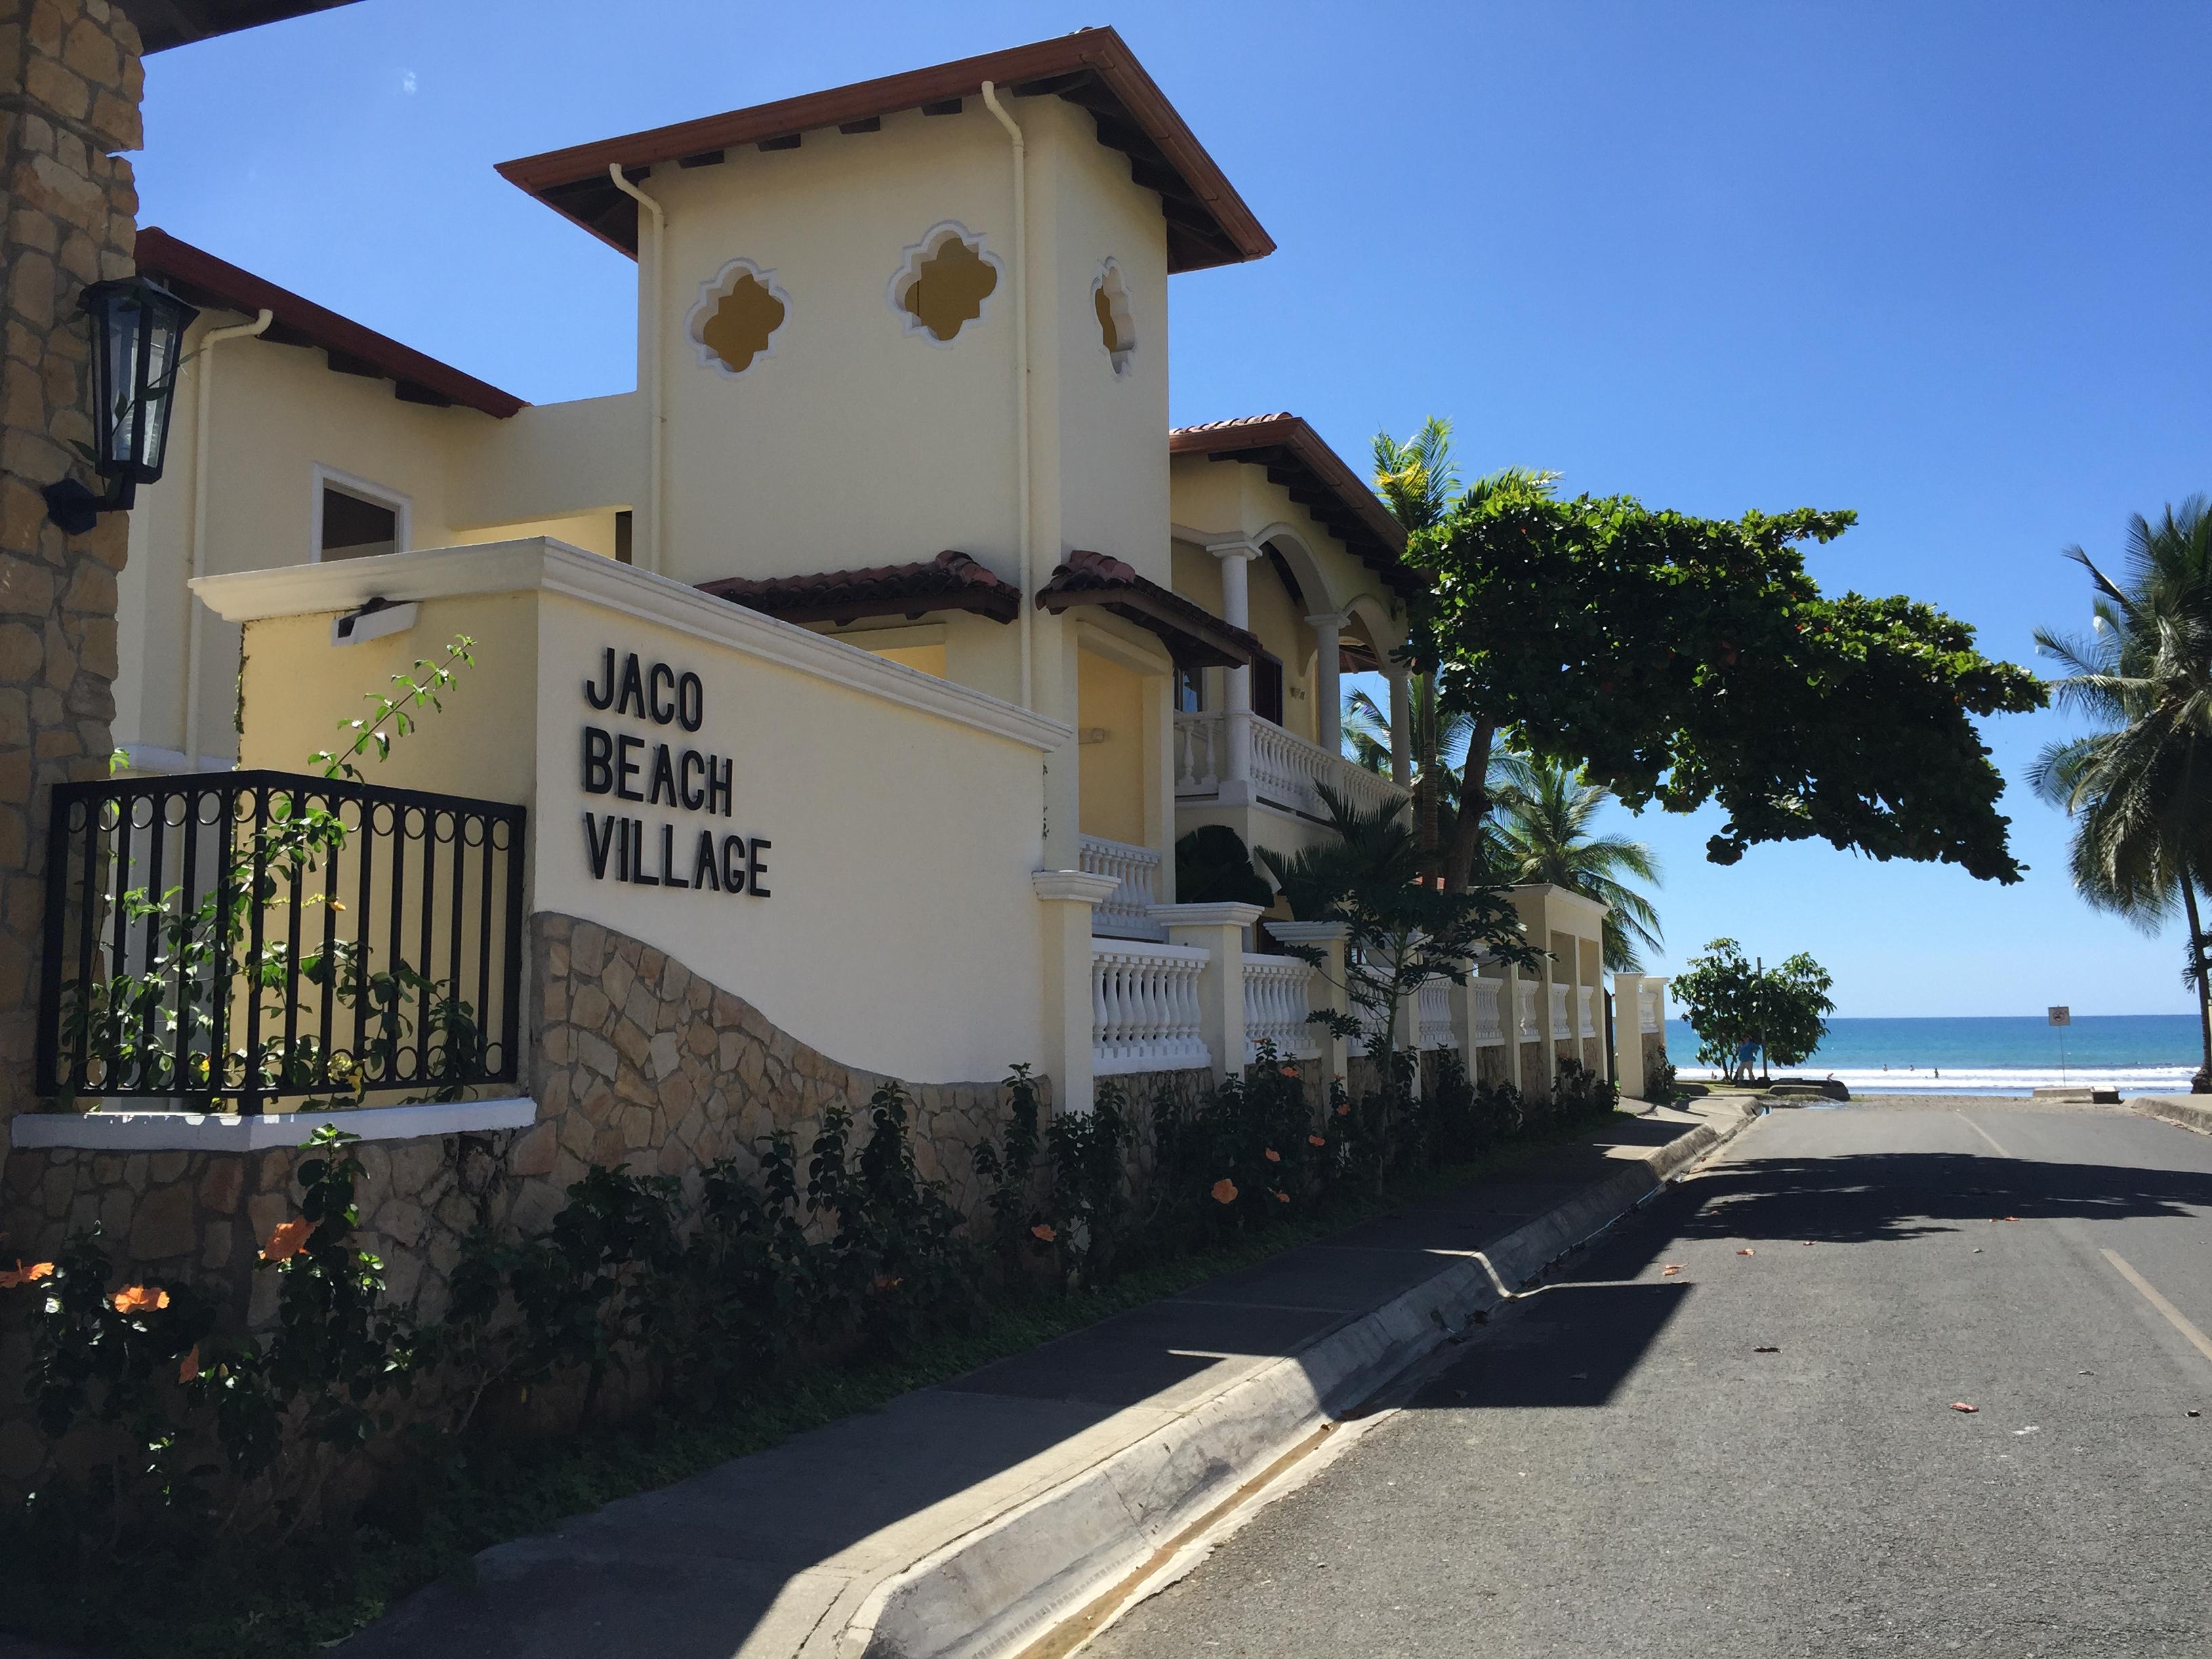 Jaco Beach Villiage Condos for sale